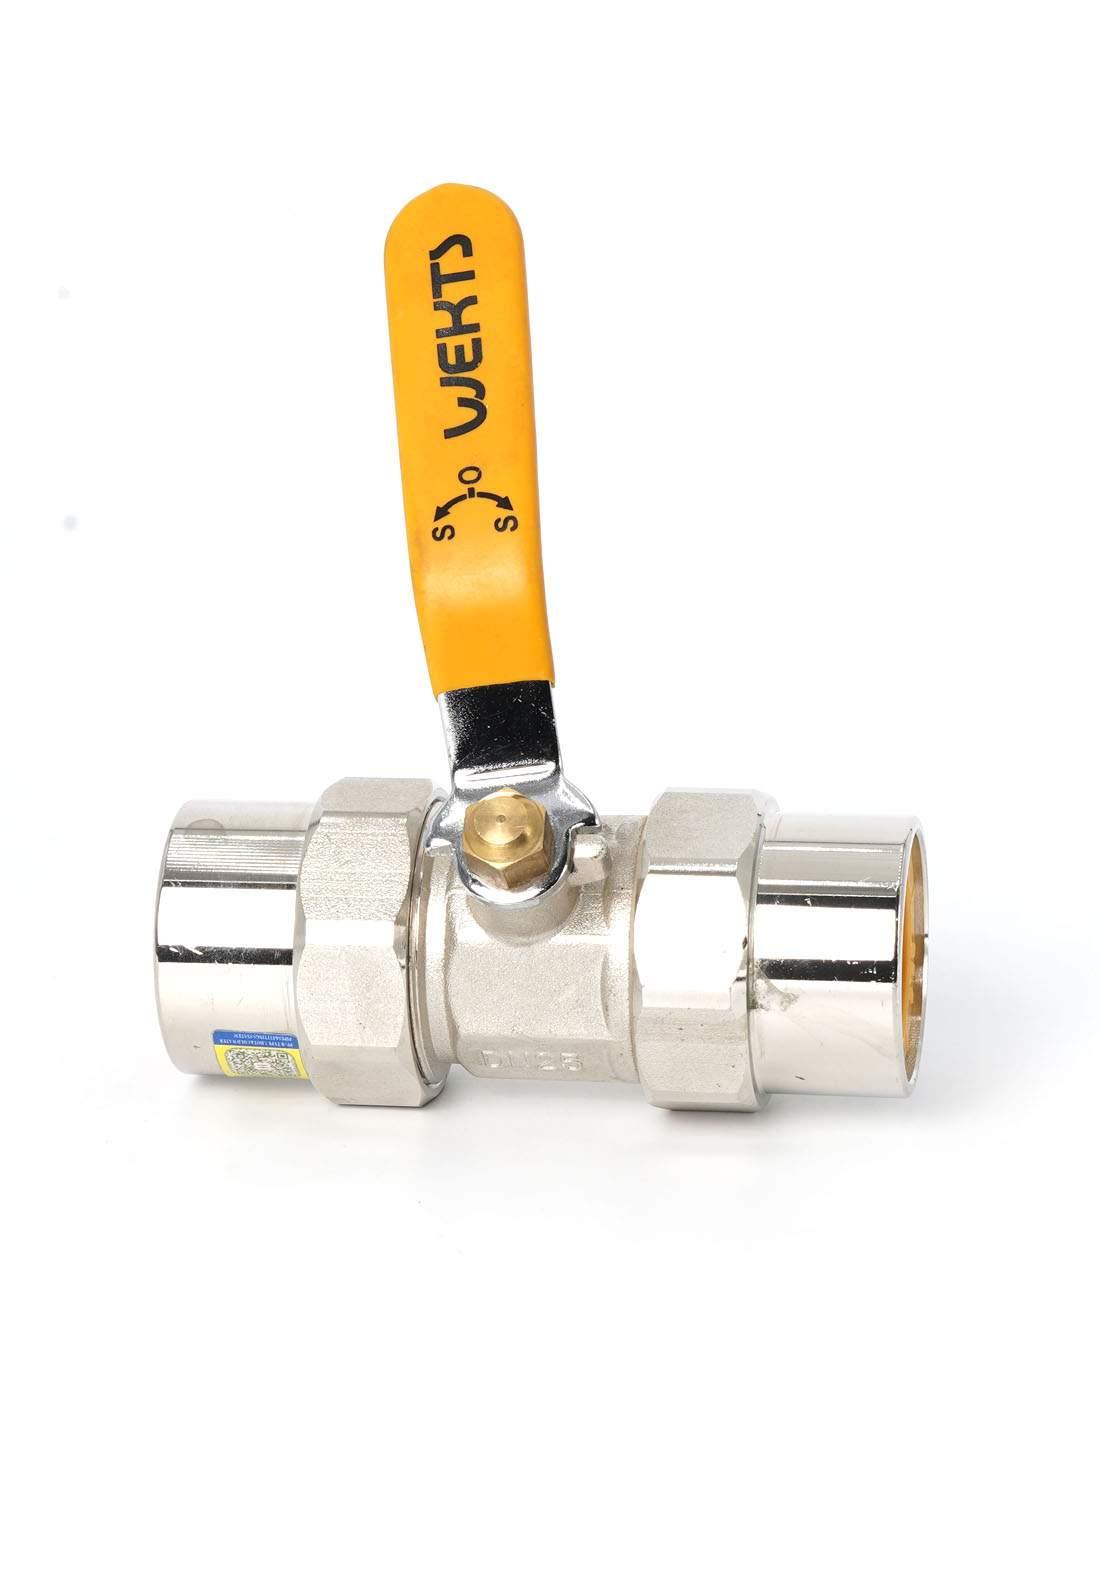 Wekts 5529 Double Chrome Flat Lock 63 mm قفل انابيب مزدوج مسطح لأنابيب المياه